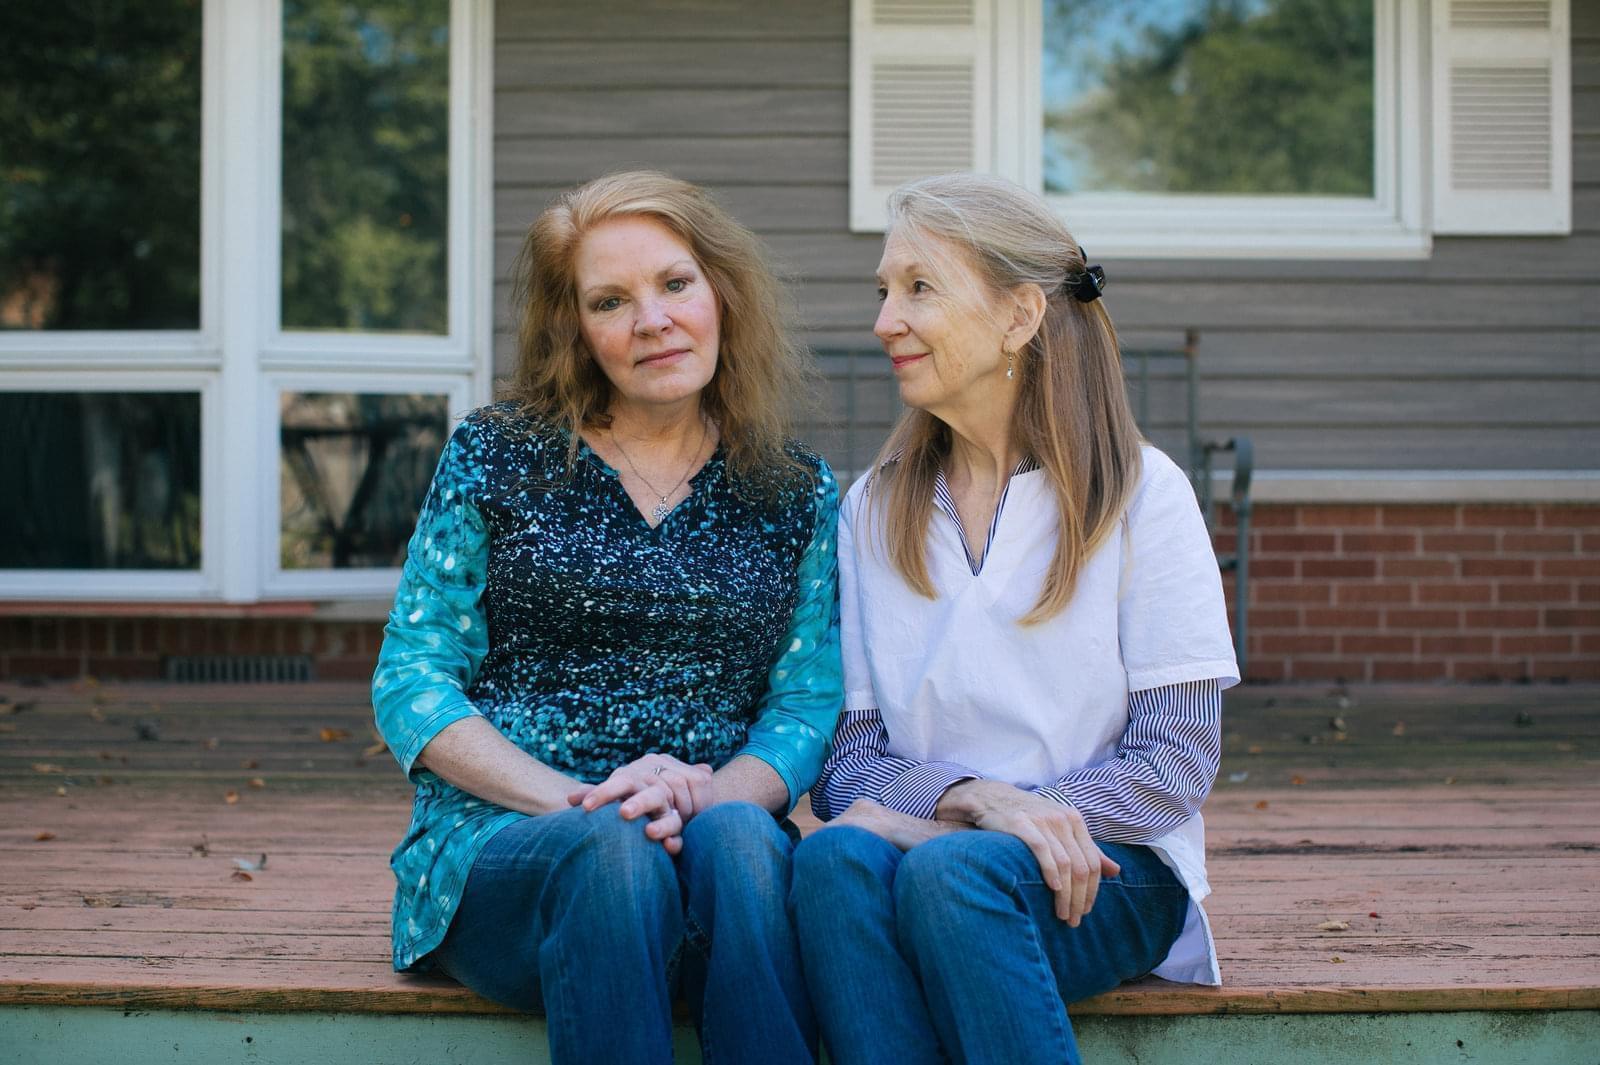 Arline Feilen and Kathy McCoy